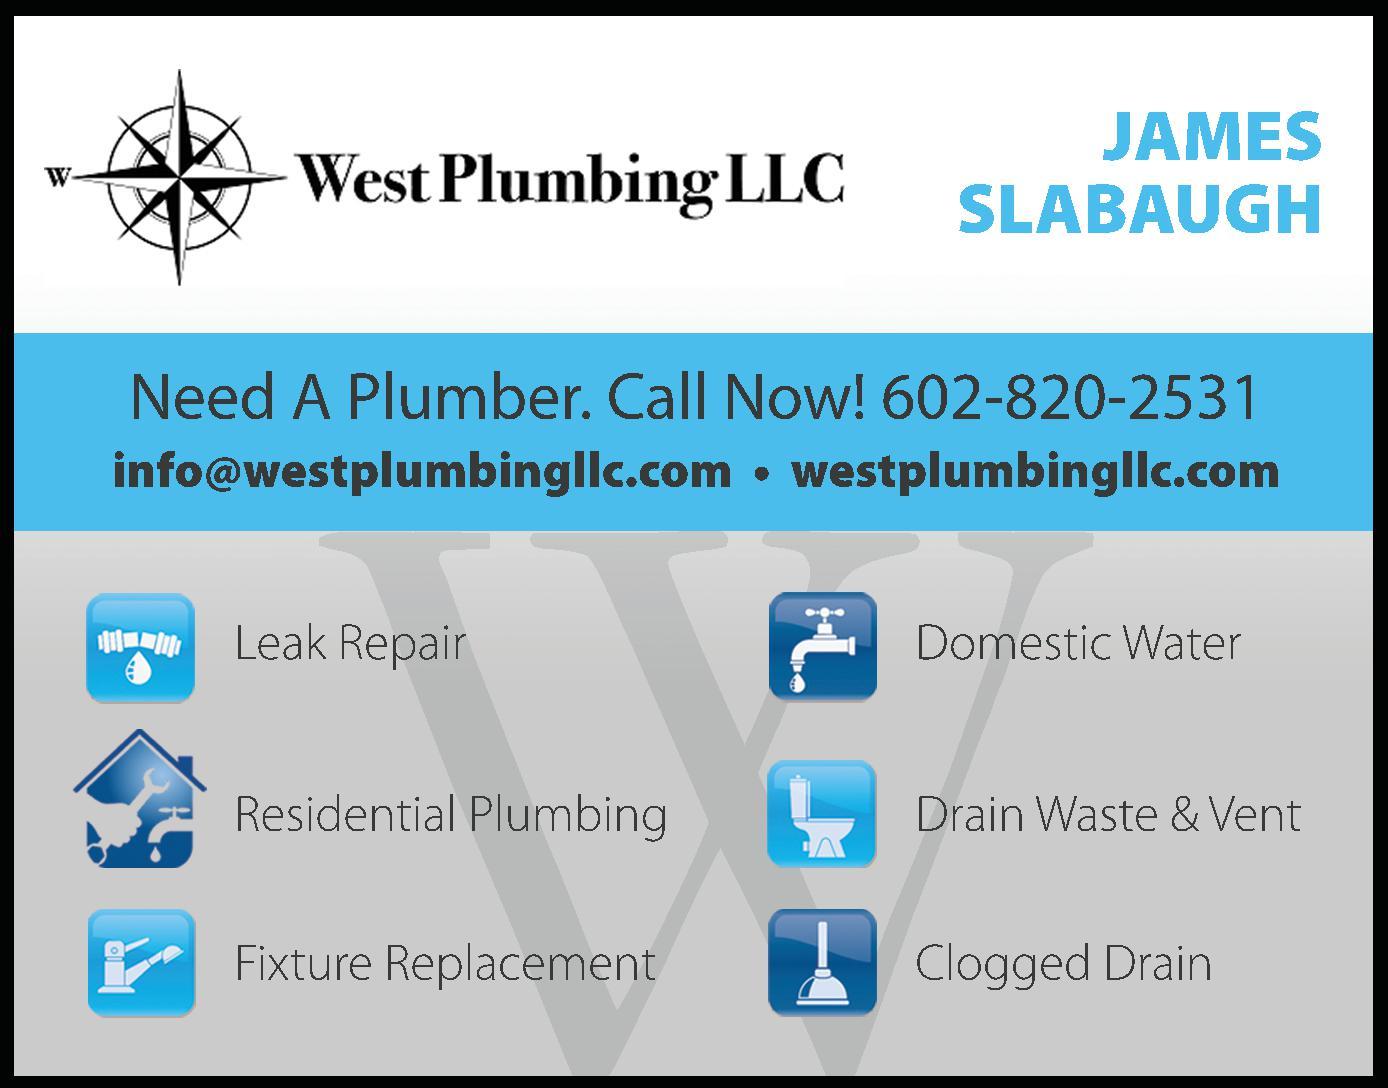 West Plumbing LLC